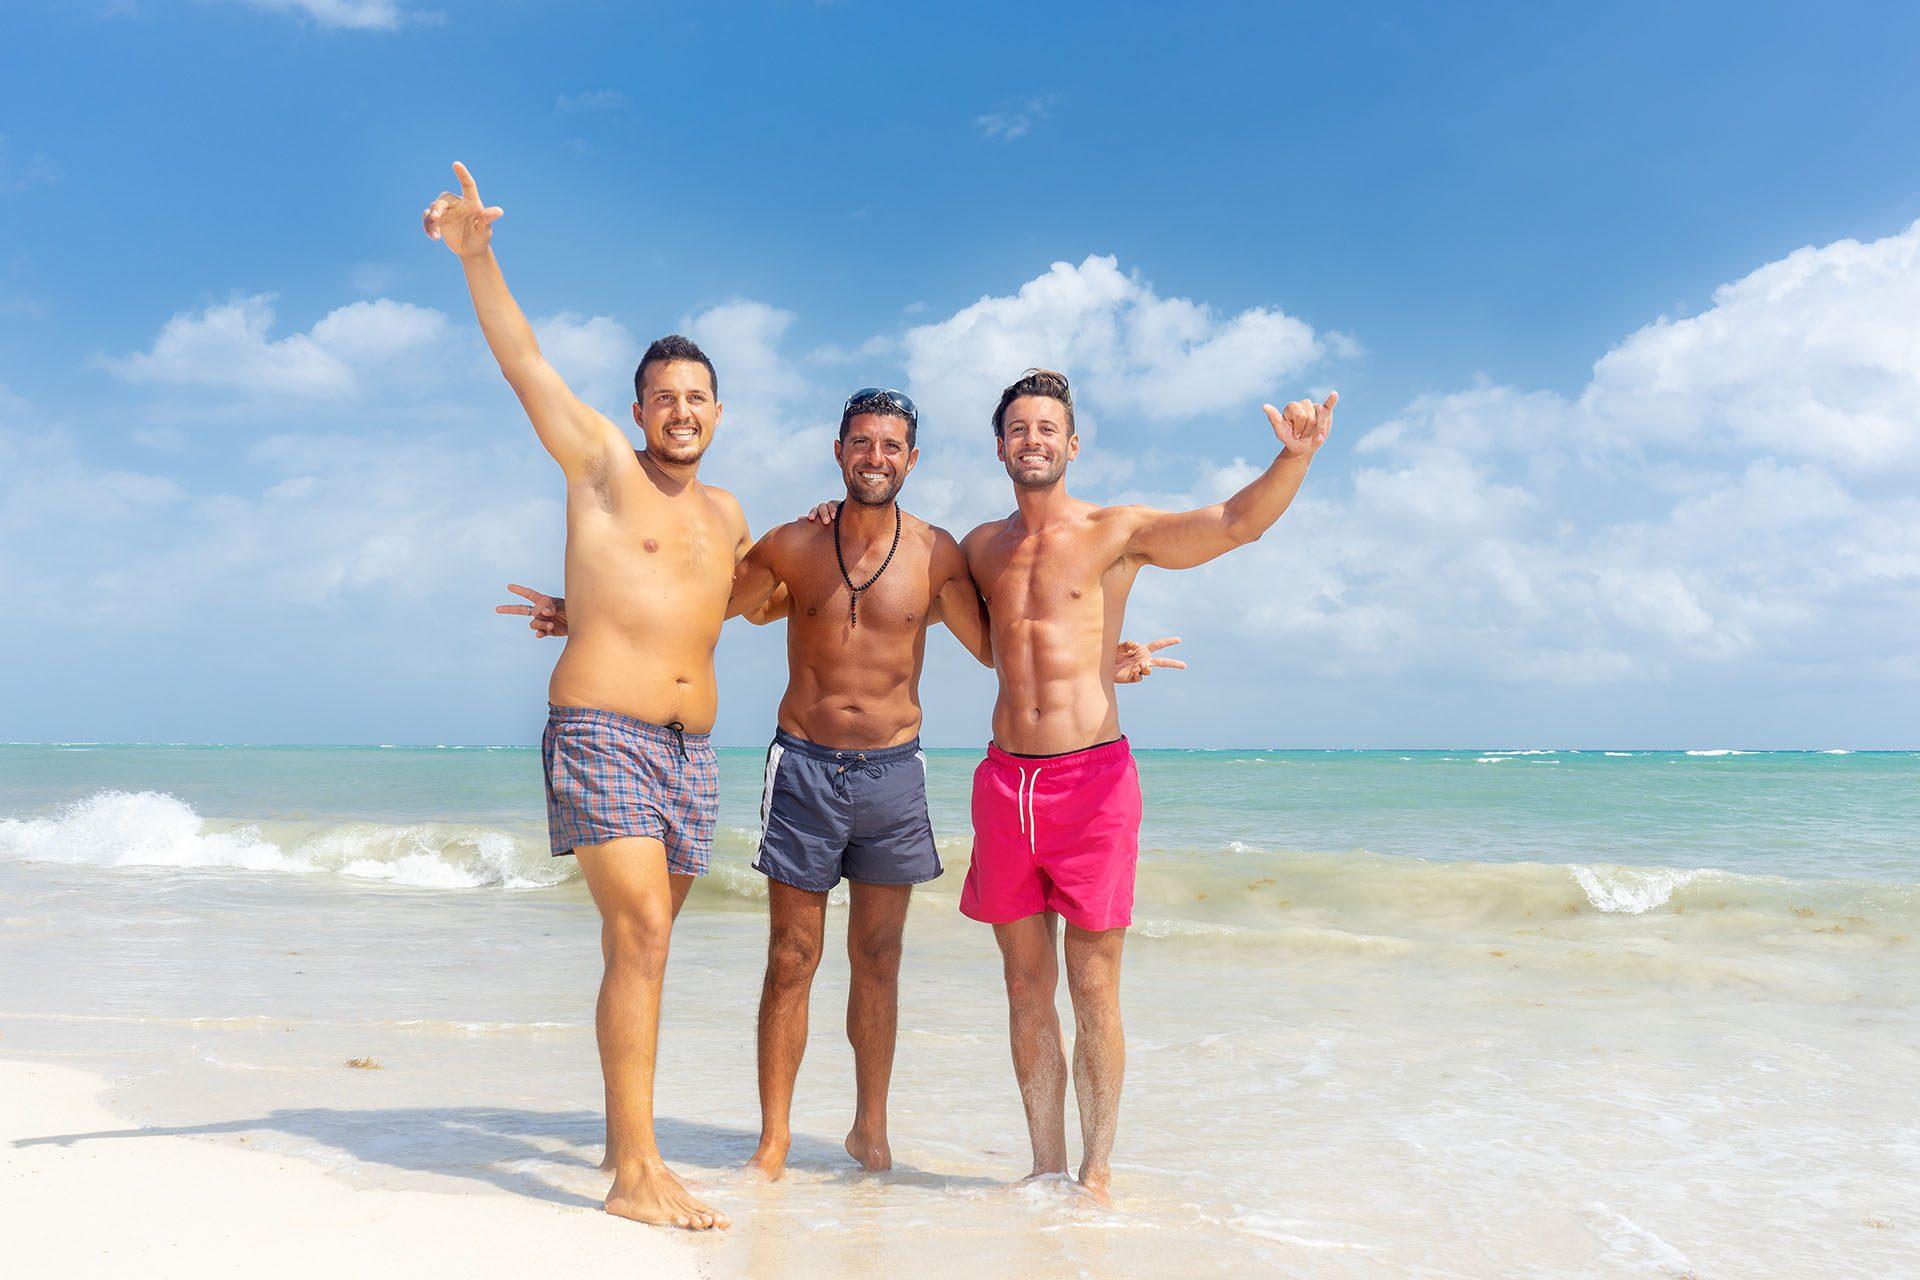 Plage gay de Cancun